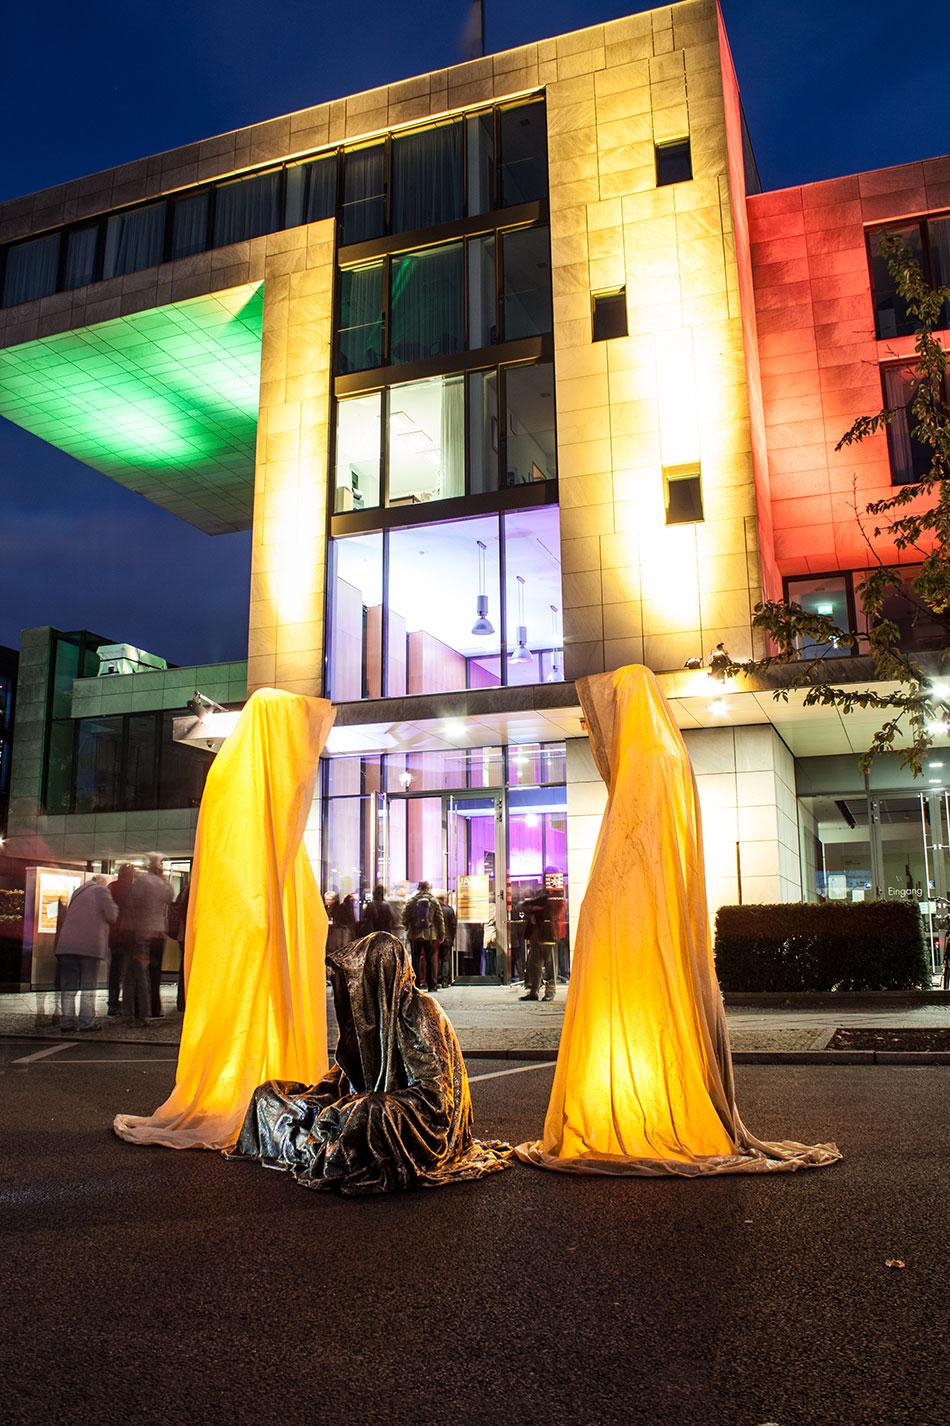 festival-of-lights-berlin-ministergaerten-light-art-festival-contemporary-fine-art-design-show-guardiansof-time-manfred-kili-kielnhofer-sculpture-3629